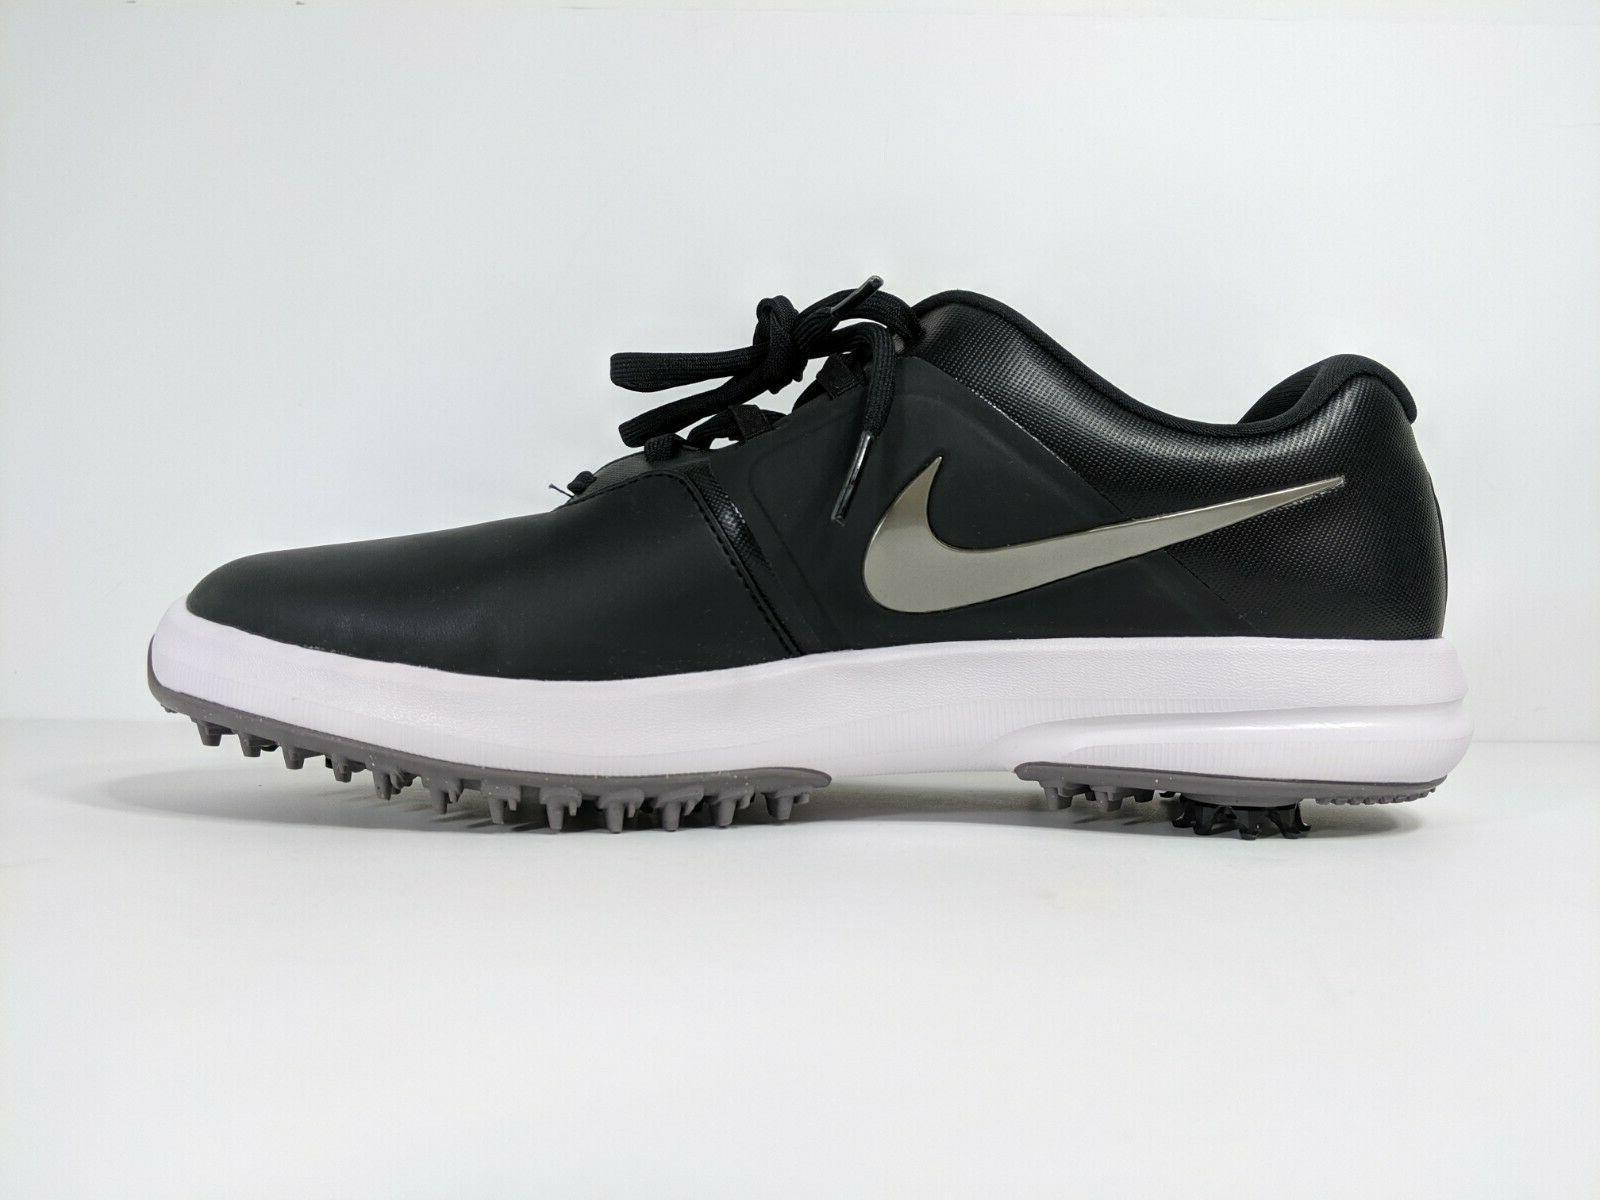 New Nike Victory Black AQ1524-001 size